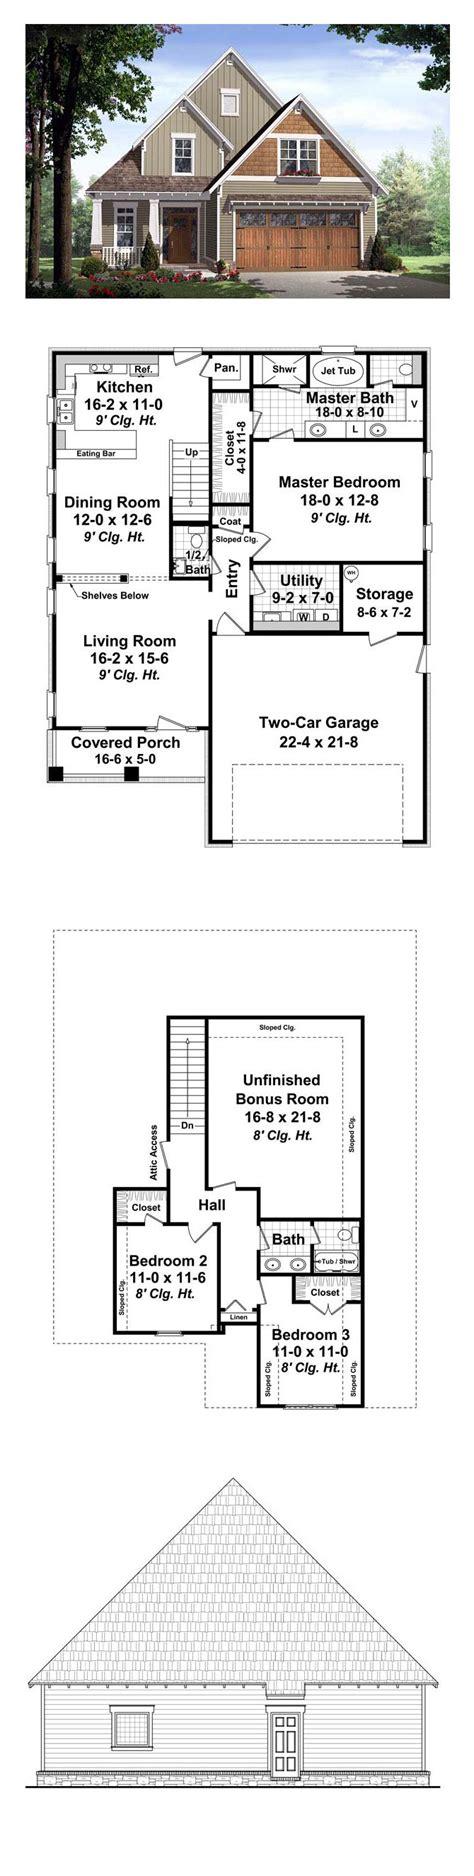 southwest home plans 100 southwest home plans southwest homes floor plans